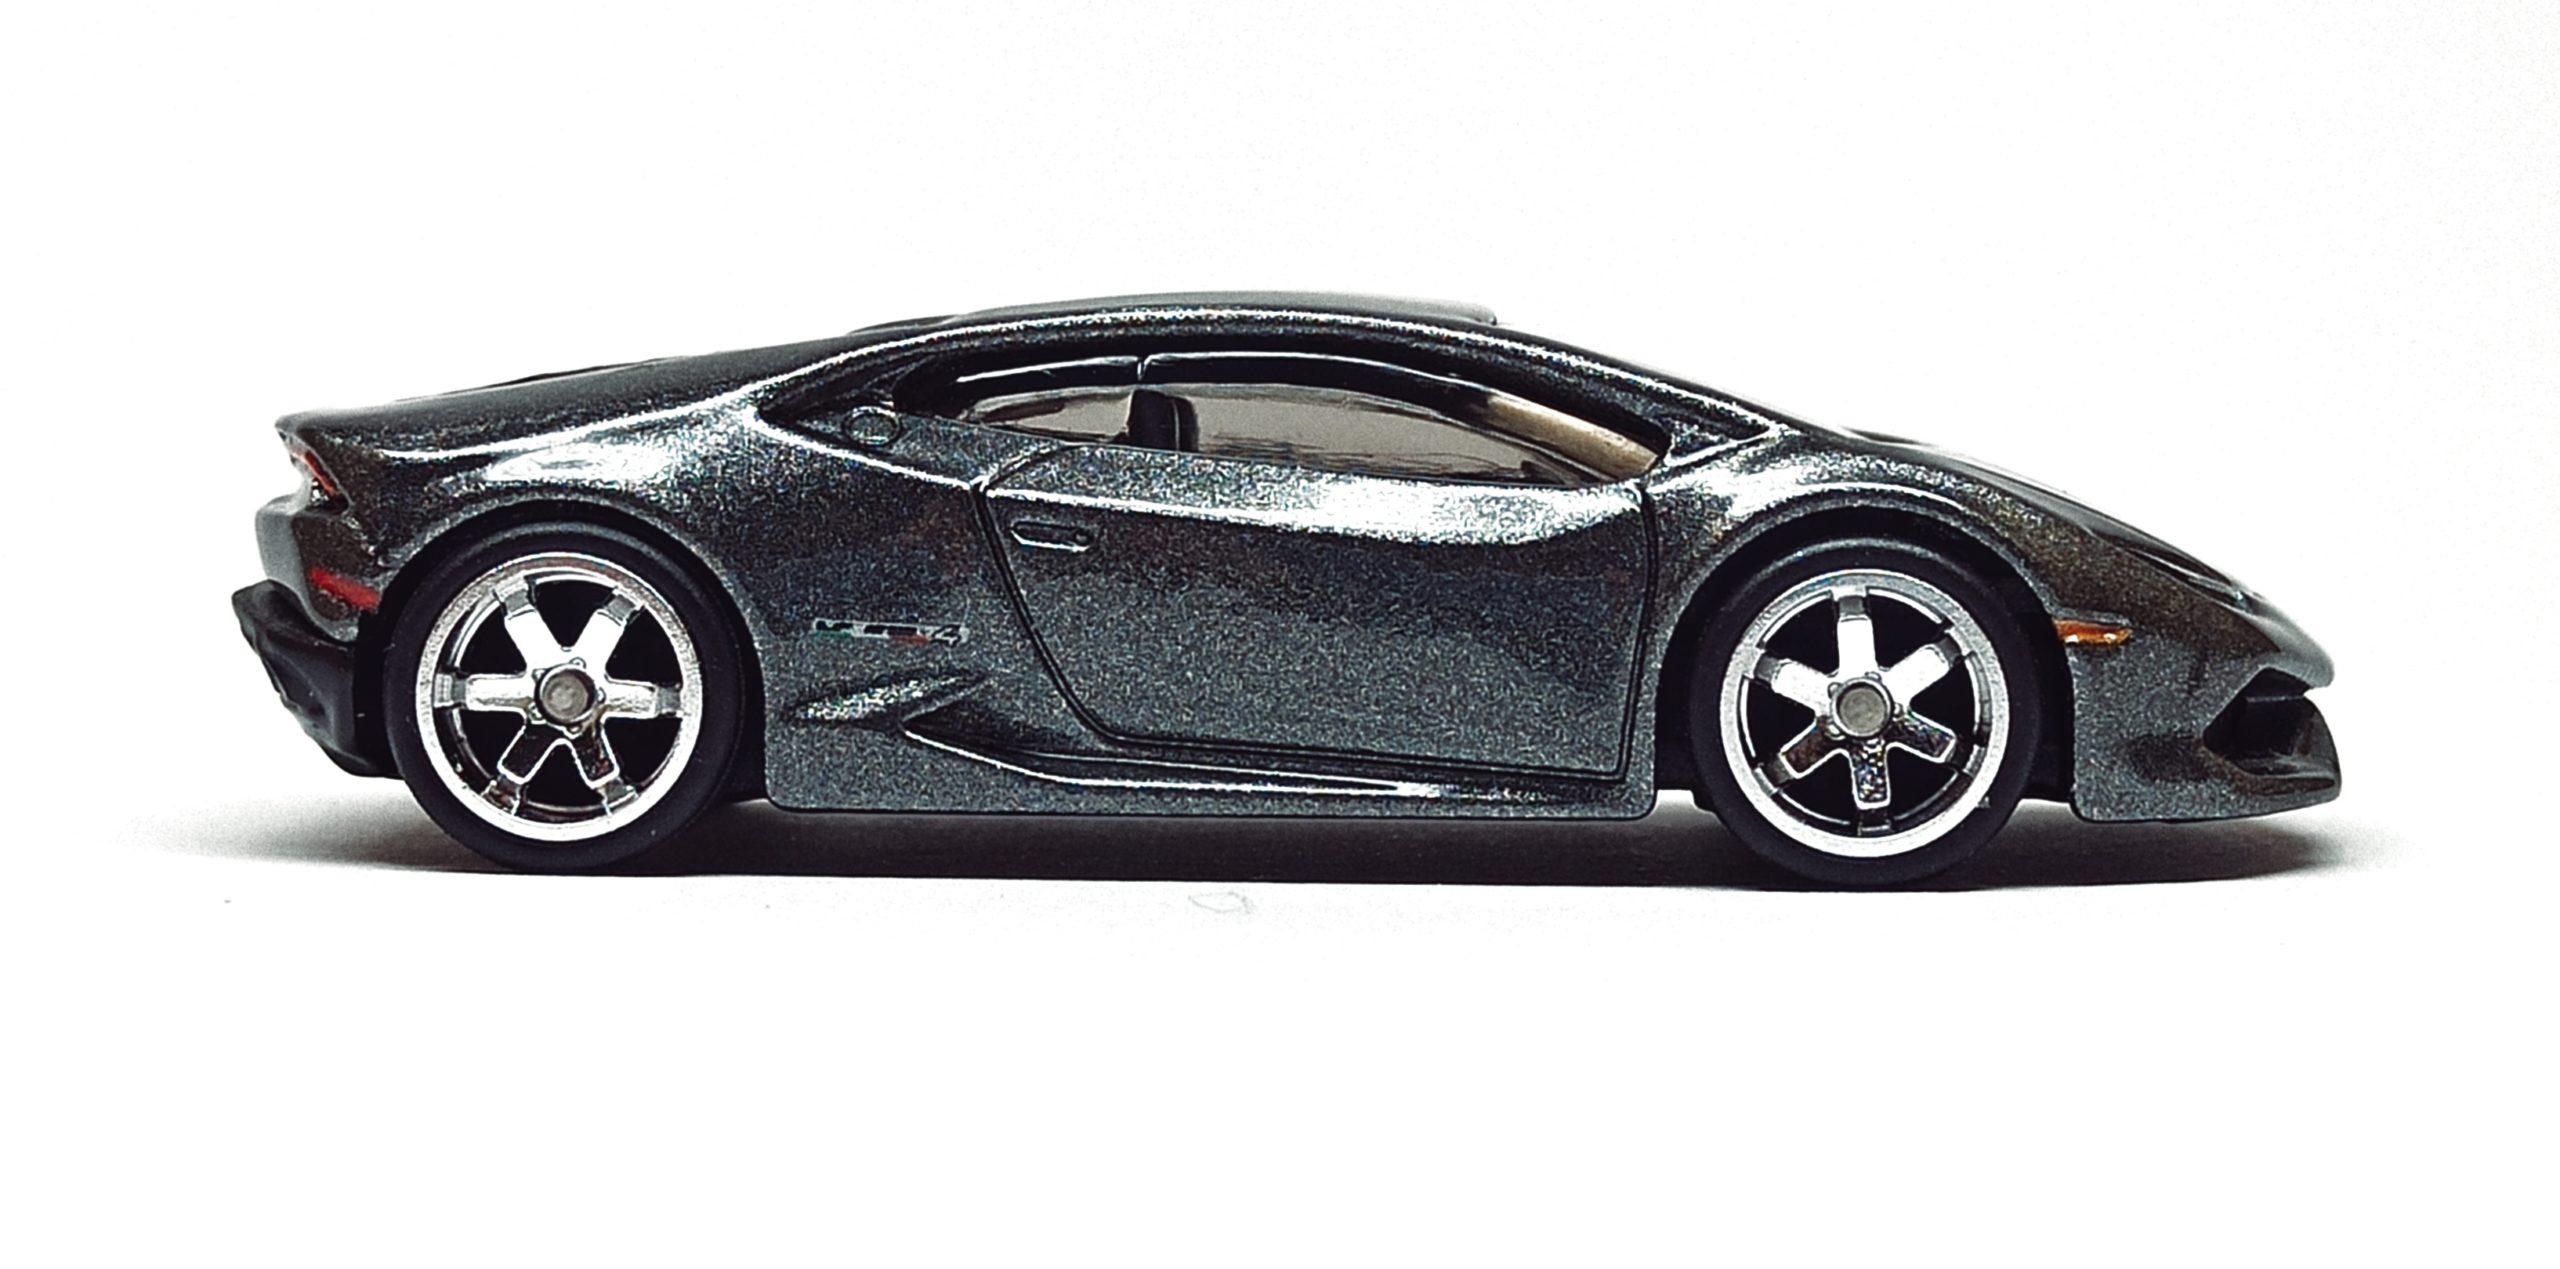 Hot Wheels Lamborghini Huracán LP 610-4 (FYP59) 2019 Replica Entertainment: Dr. Strange metallic gray